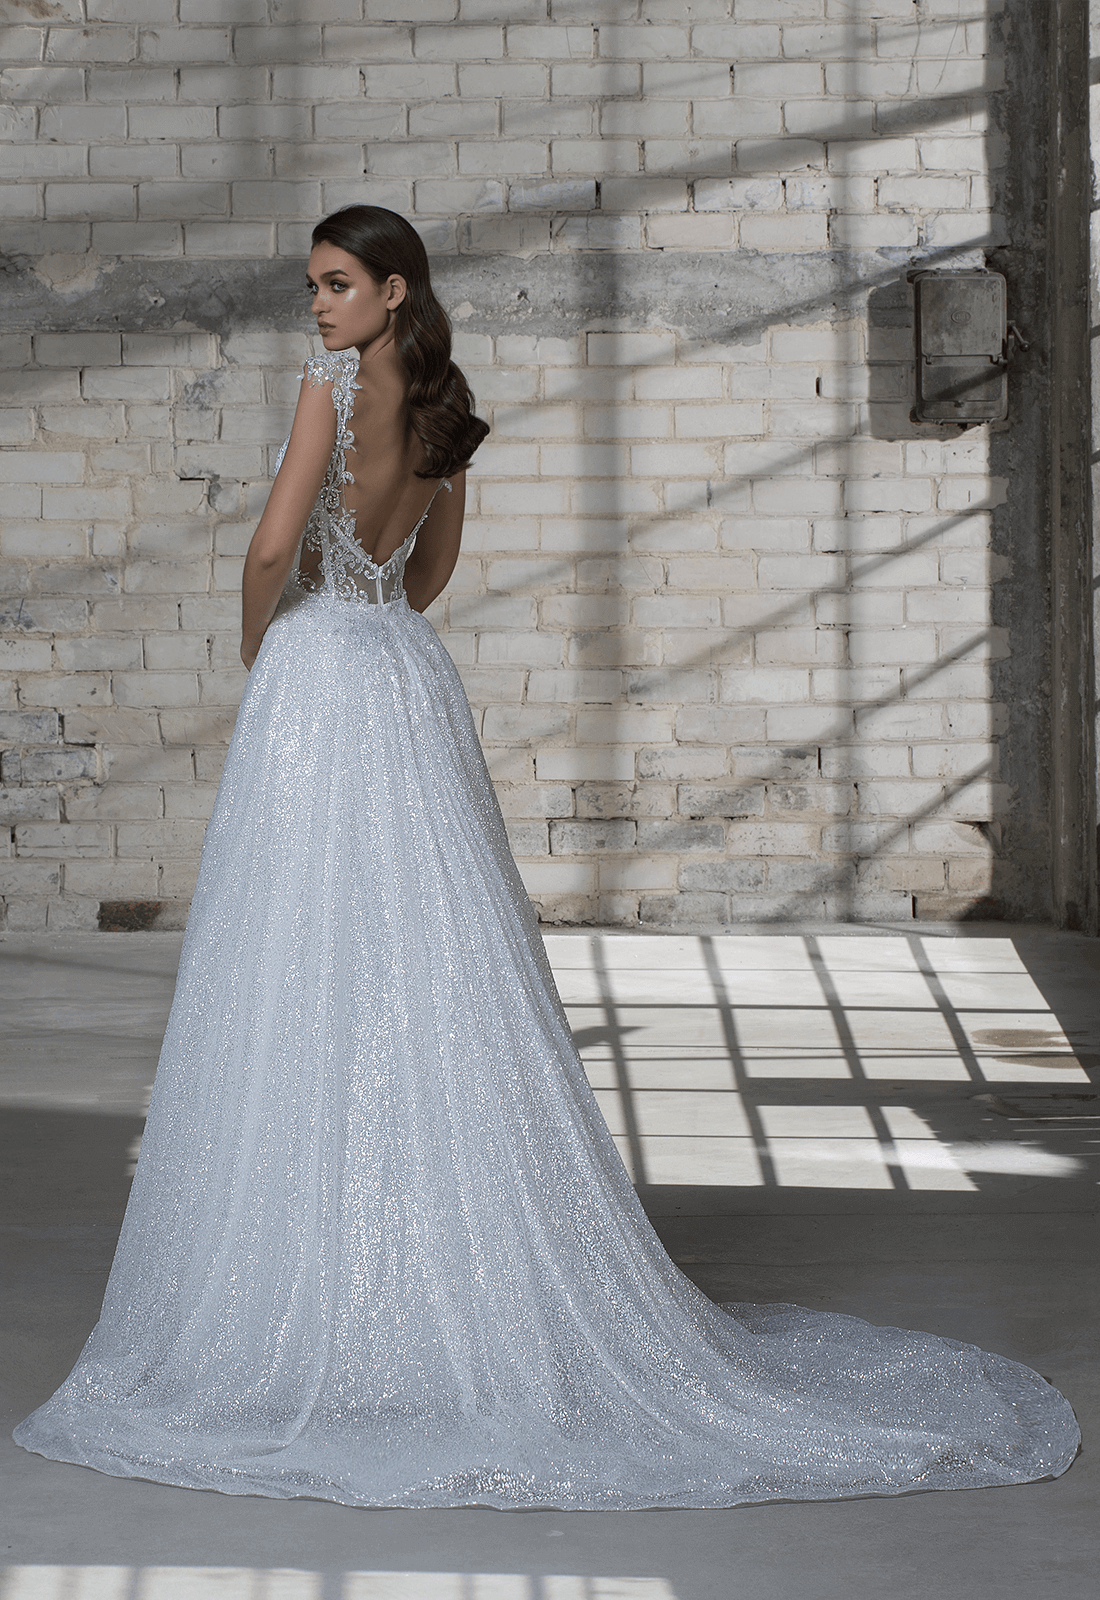 Fancy Pnina Tornai Wedding Dresses Adornment - All Wedding Dresses ...